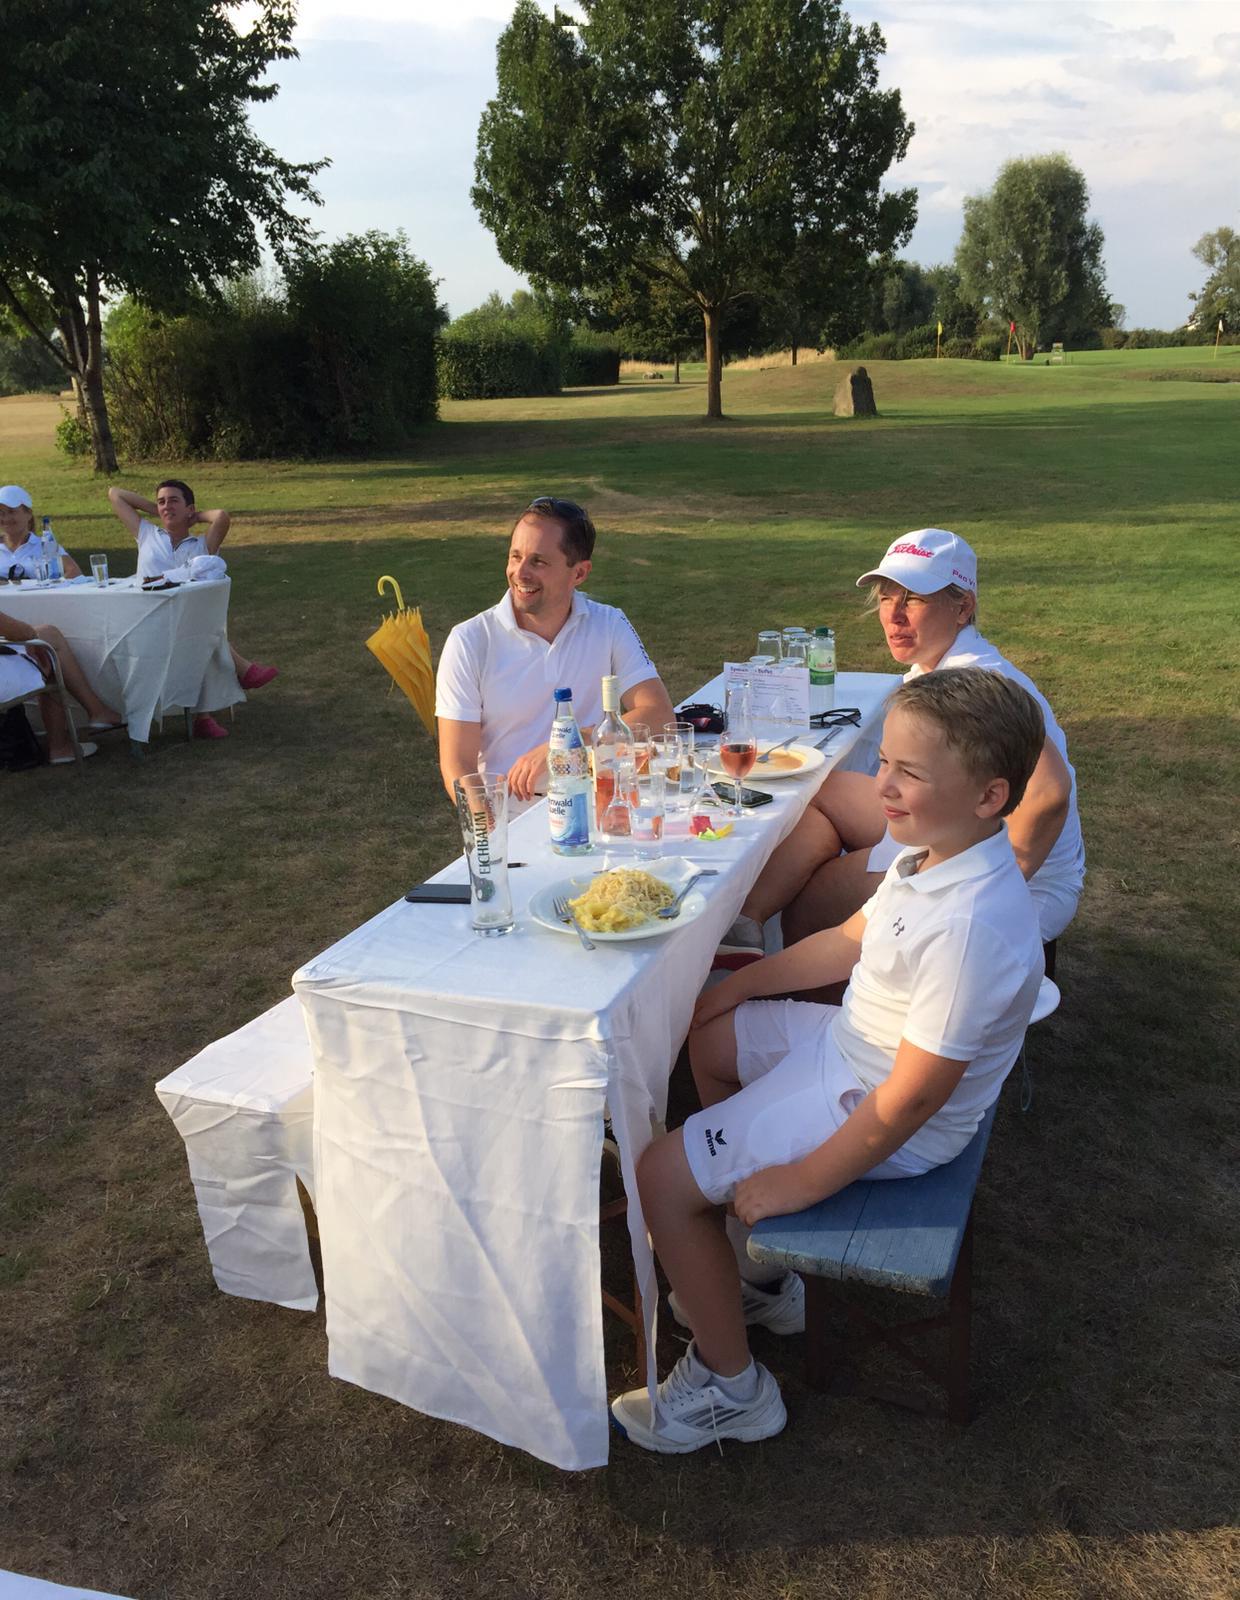 65_Golfturnier_Soroptimist_Golf_en_blanc